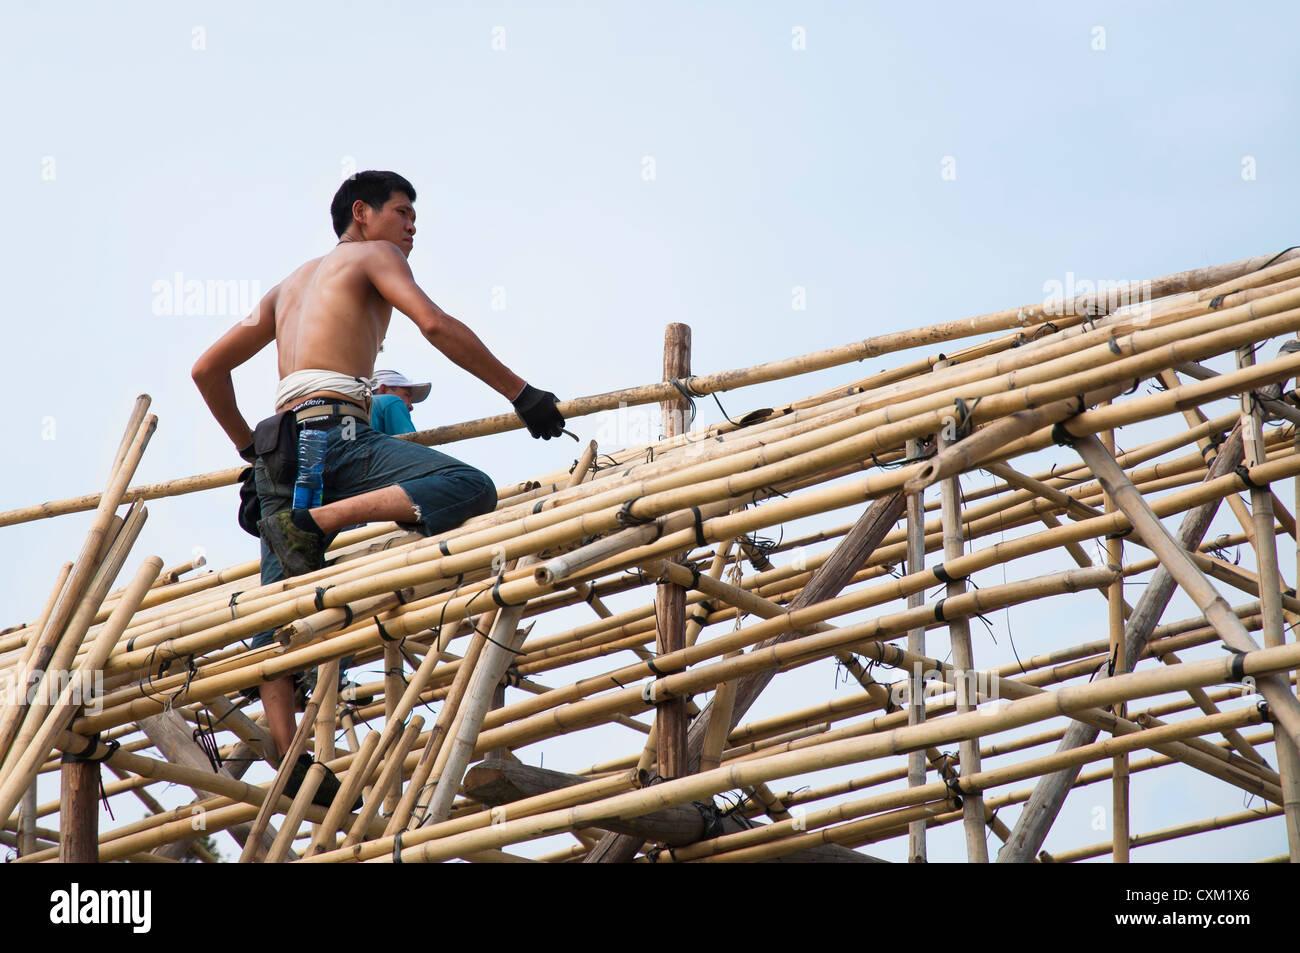 Workman erecting bamboo scaffolding before the Cheung Chau bun festival, Hong Kong - Stock Image